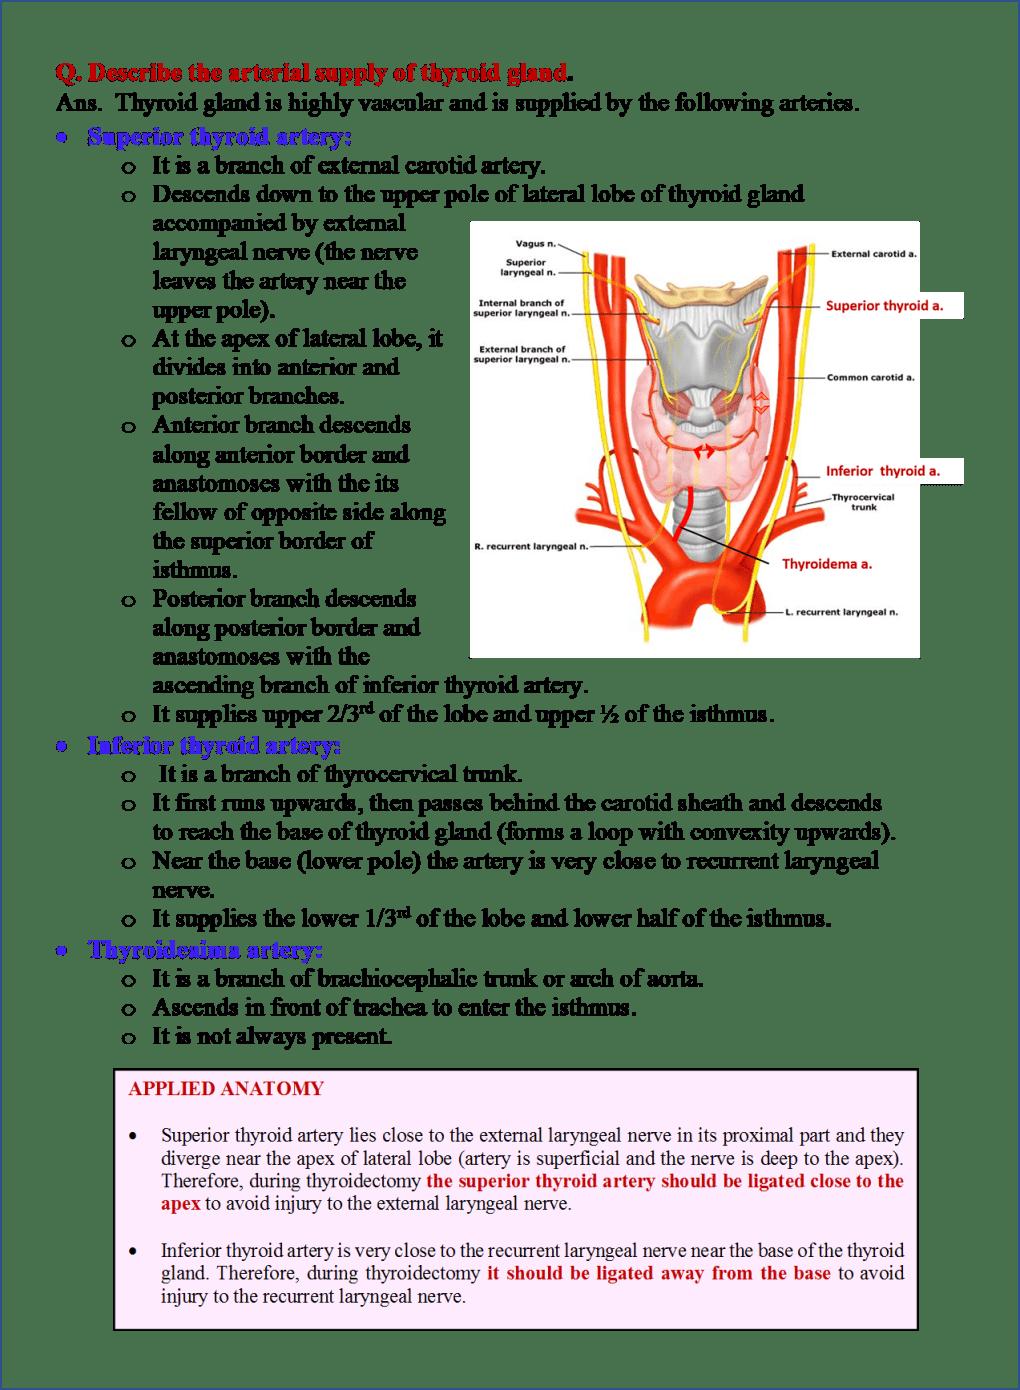 arterial supply of thyroid gland